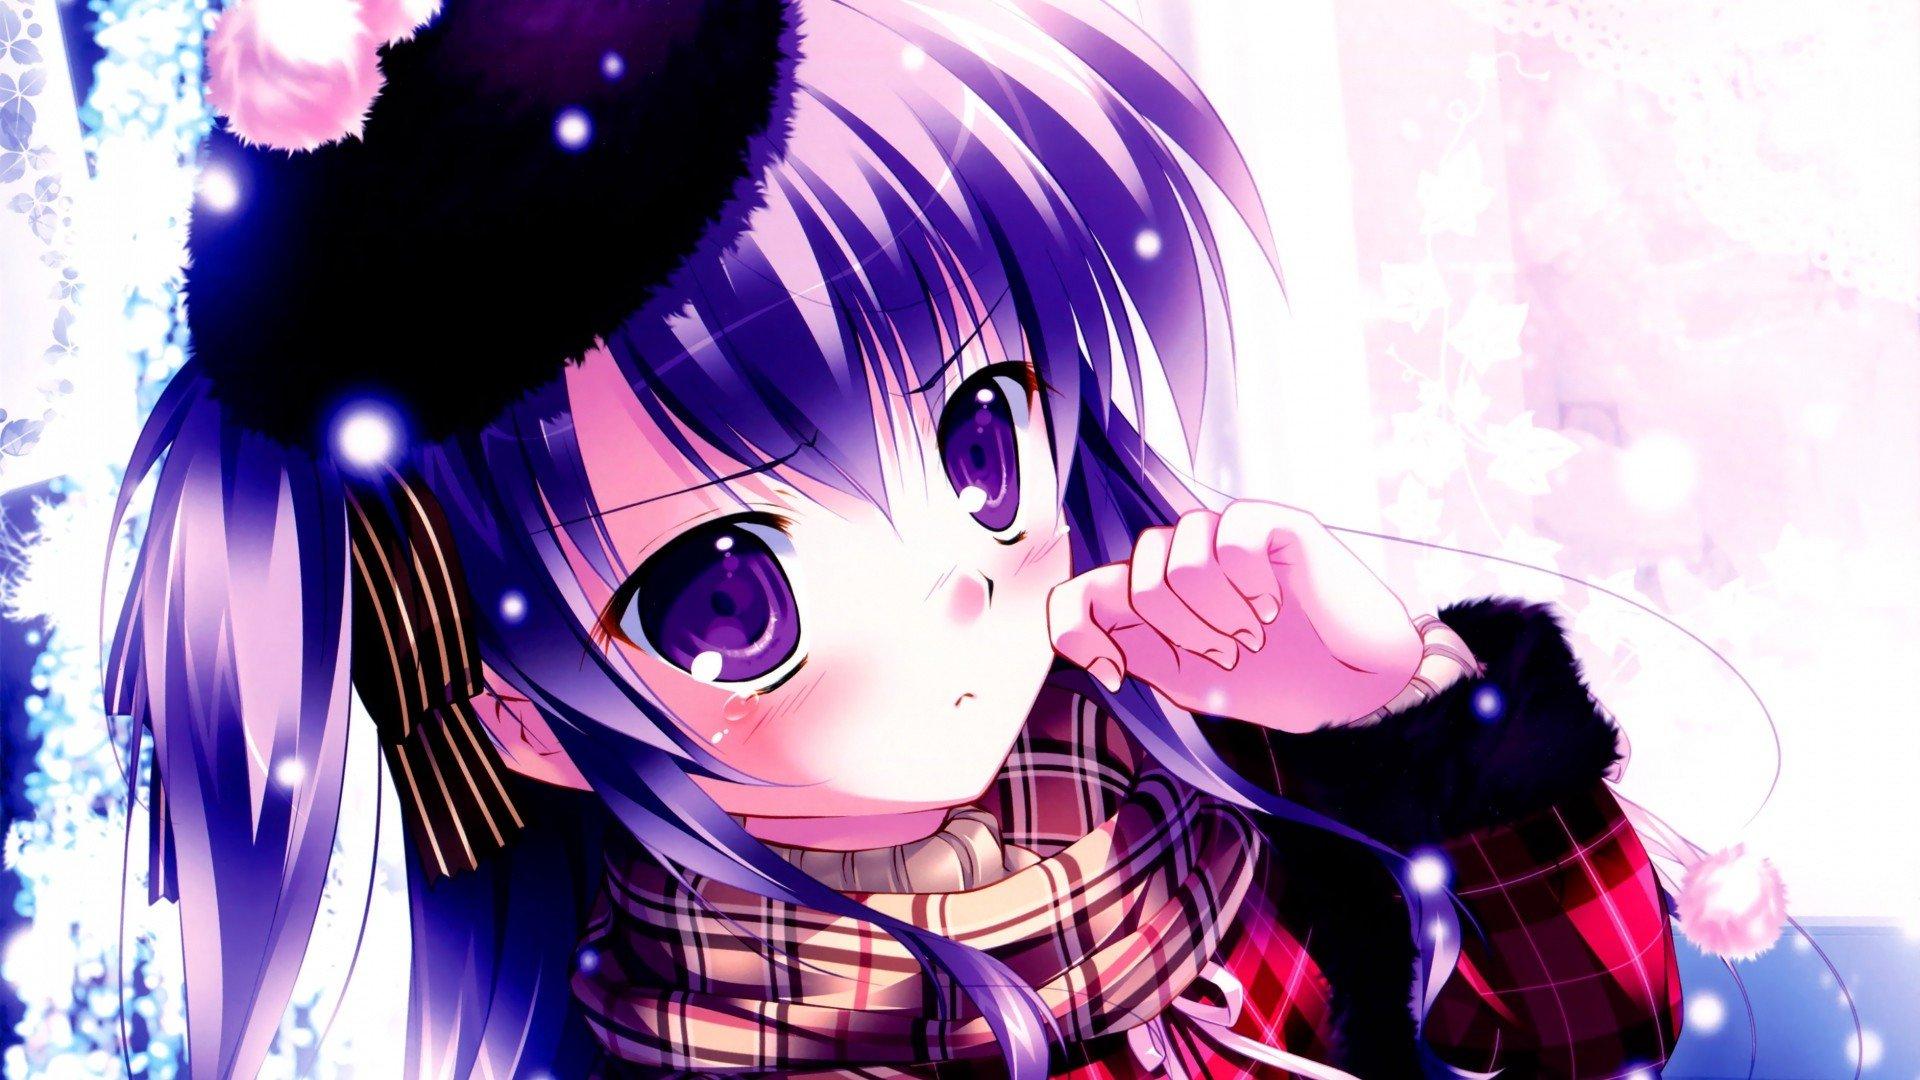 Free Download Anime Girl Wallpaper Id 151410 Hd 1080p For Desktop